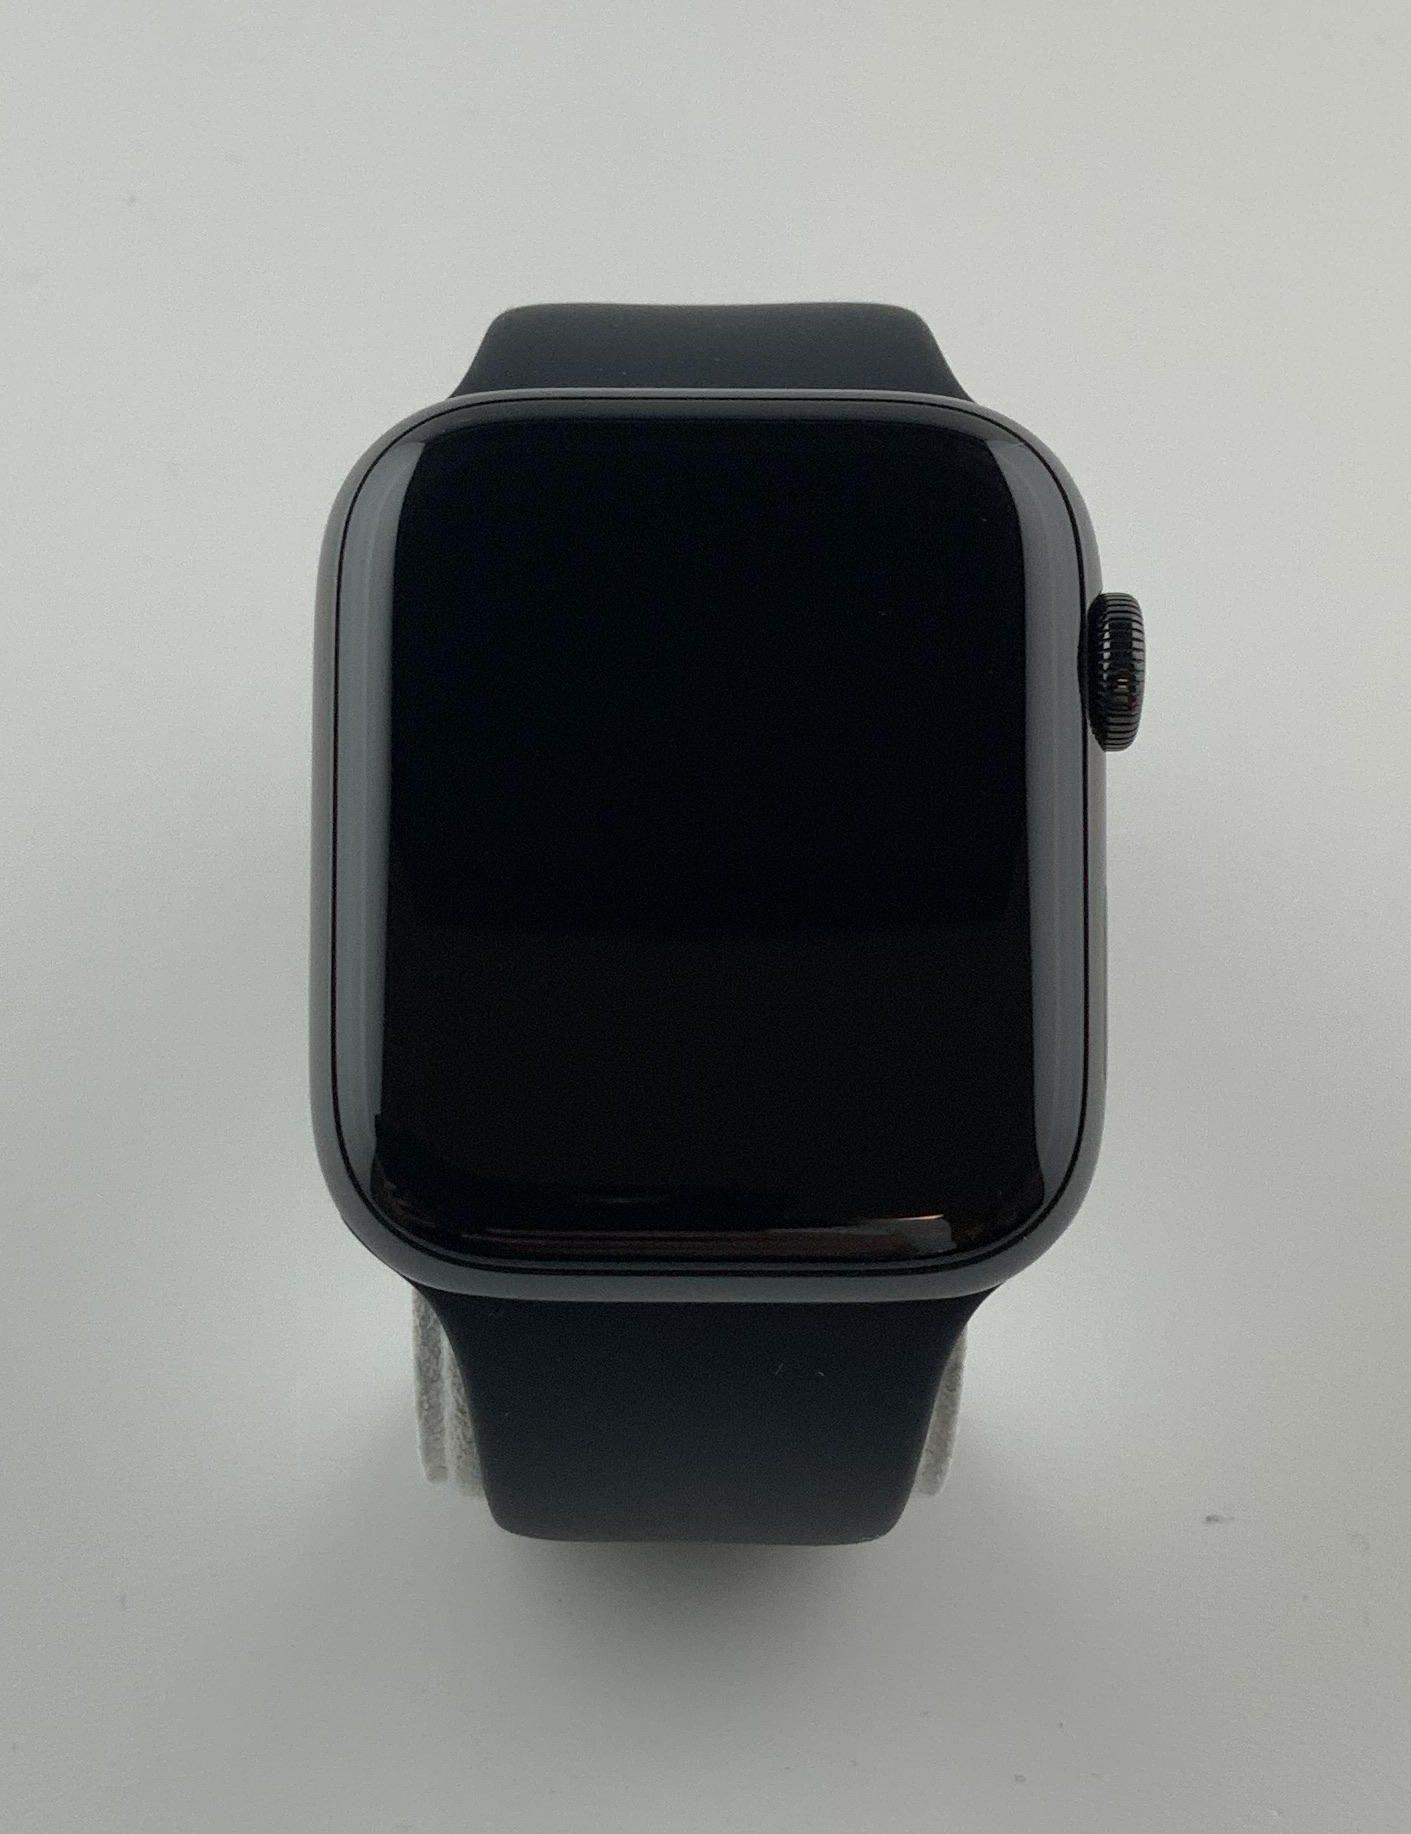 Watch Series 4 Steel Cellular (44mm), Space Black, Black Sport Band, Kuva 1